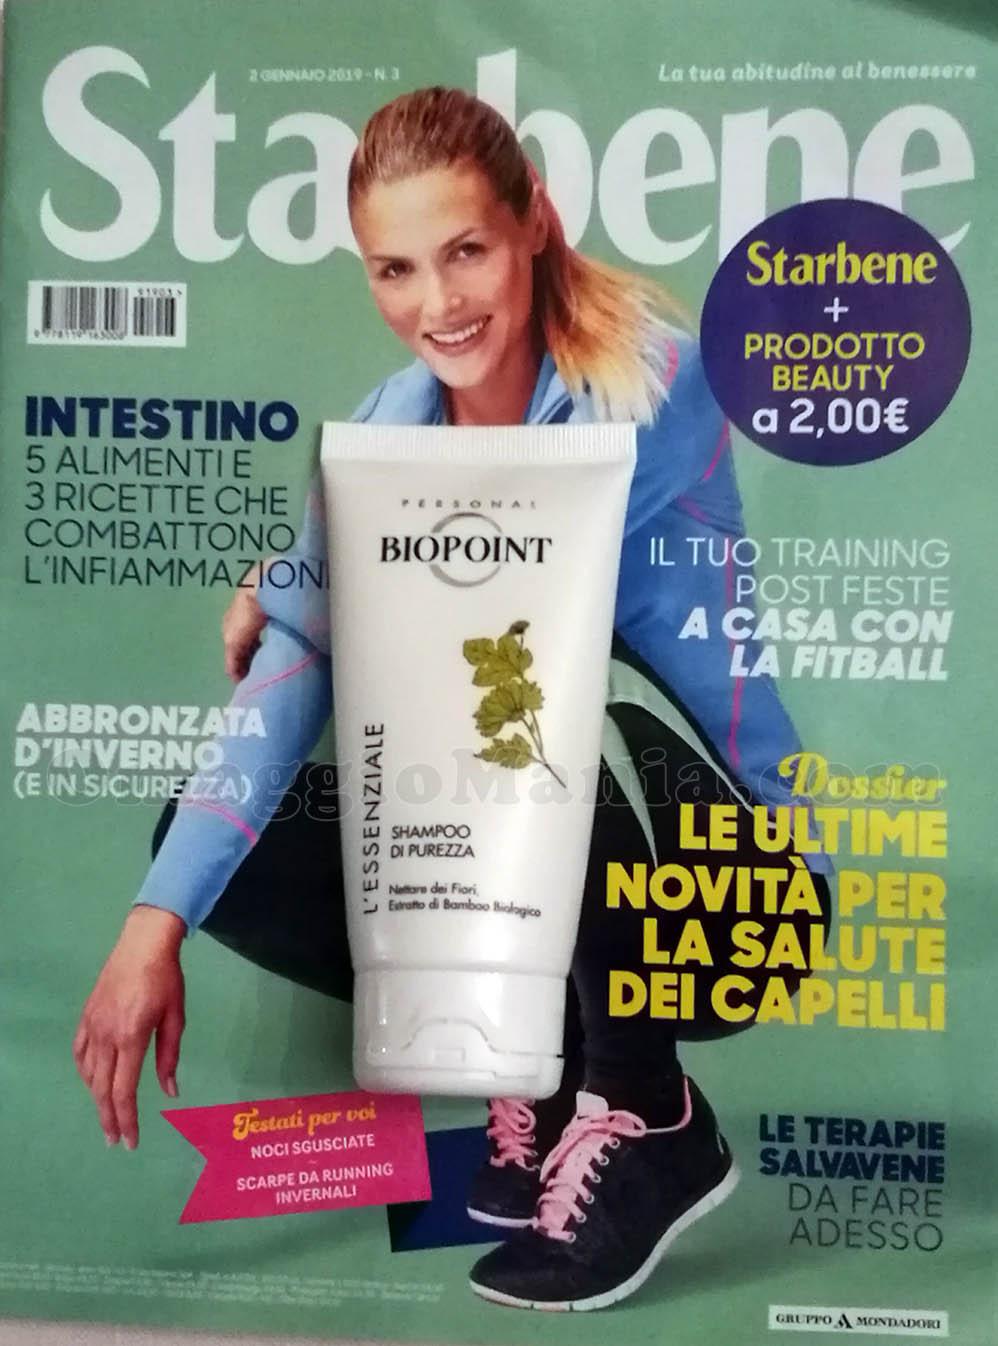 shampoo Biopoint L'Essenziale con Starbene n.3